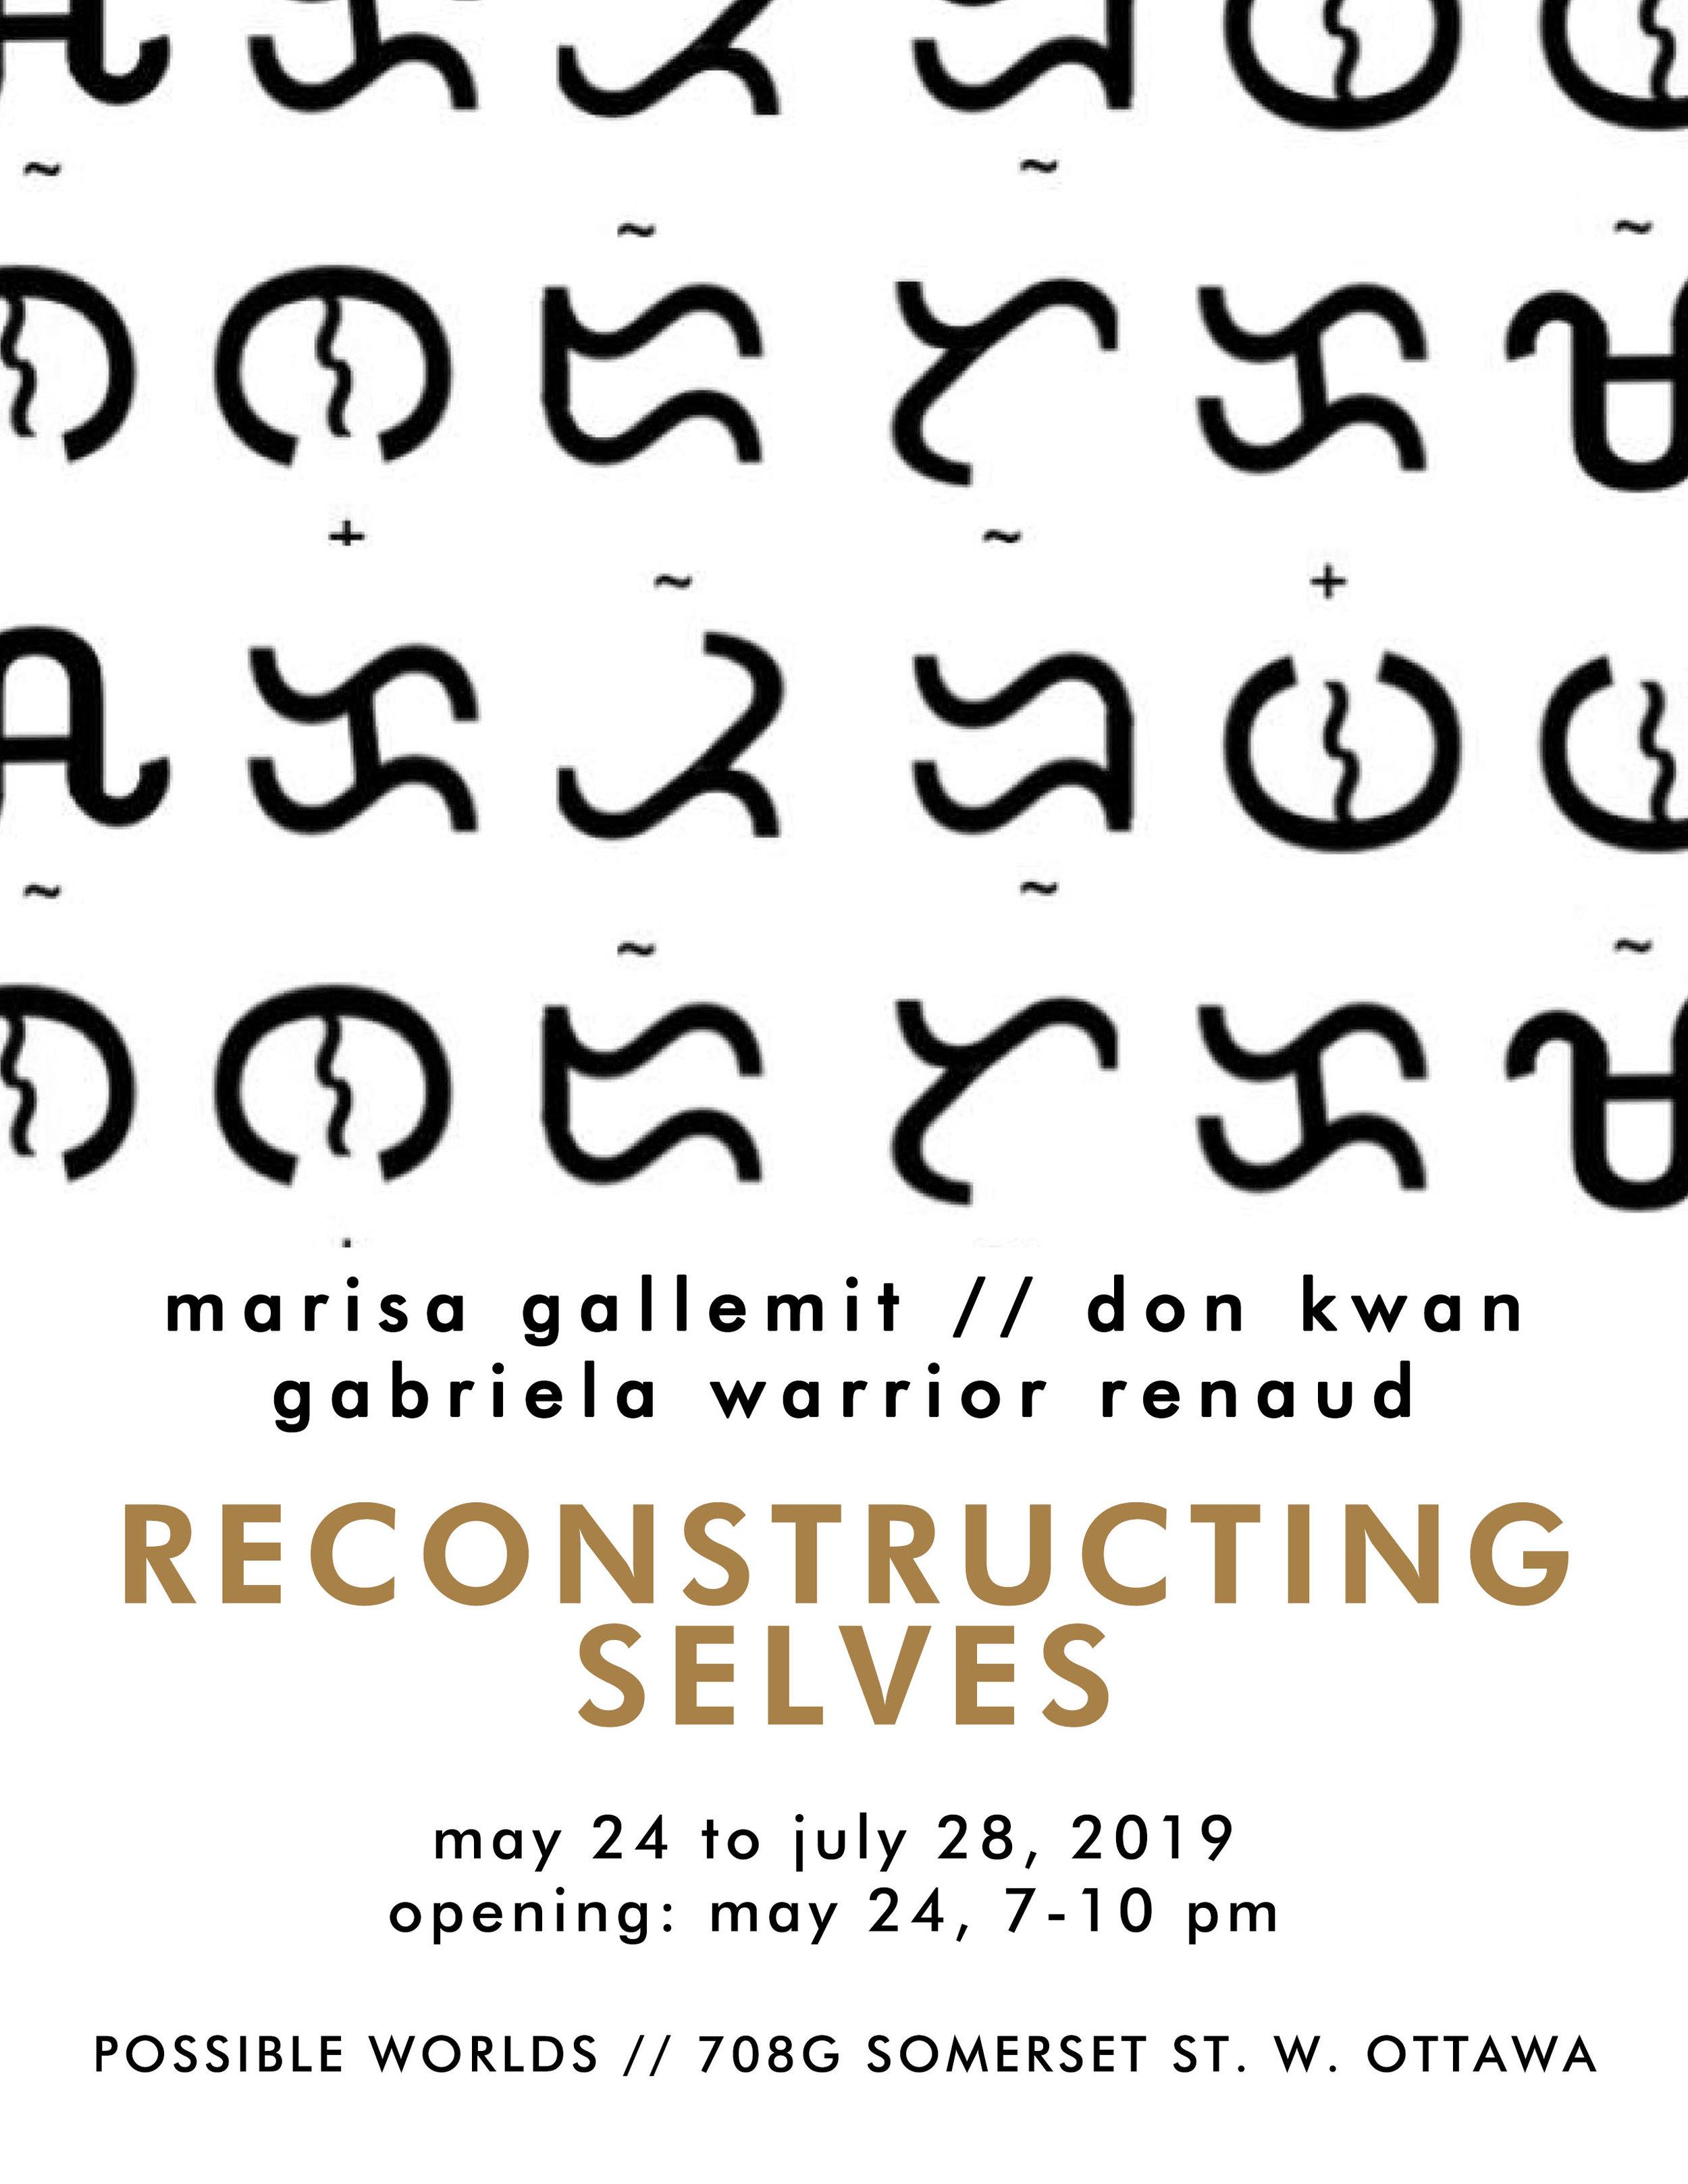 reconstructing-selves-poster.jpg